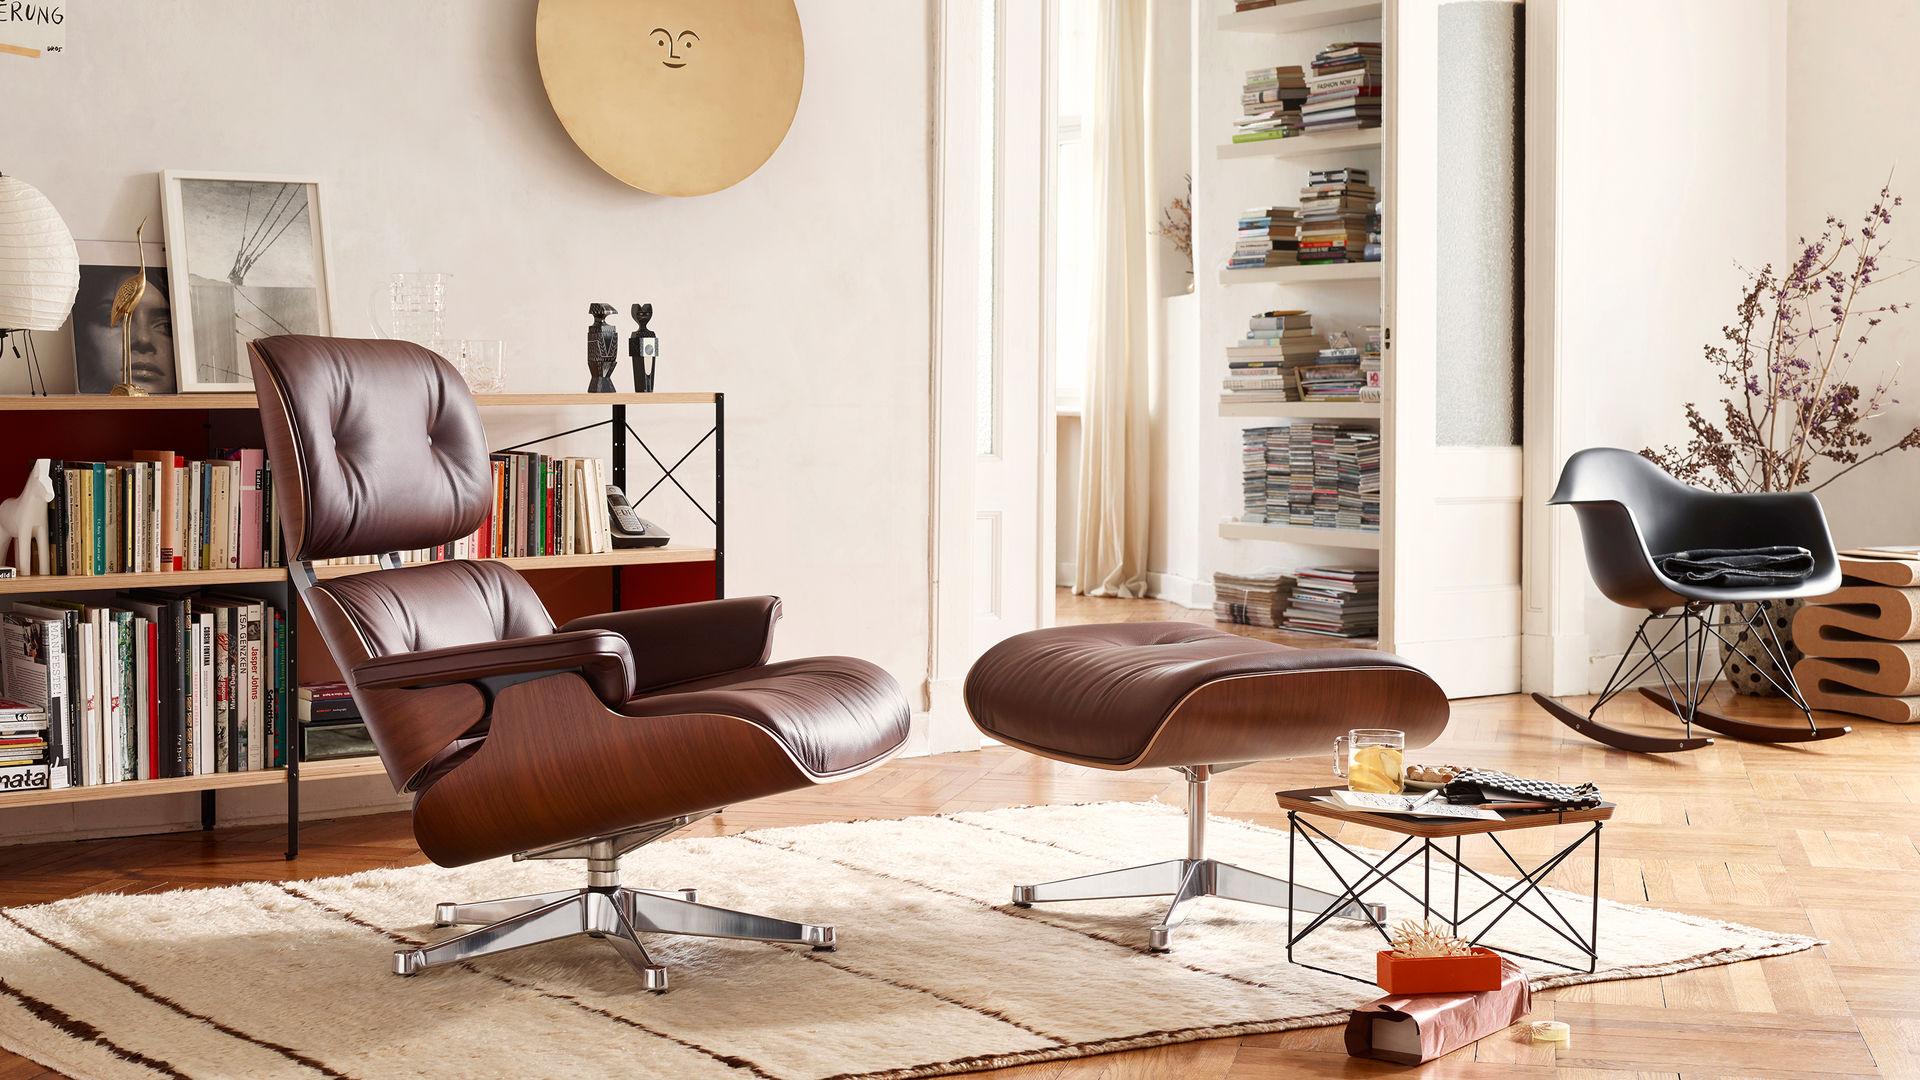 Eames Chair With Ottoman Vitra Lounge Chair Ottoman